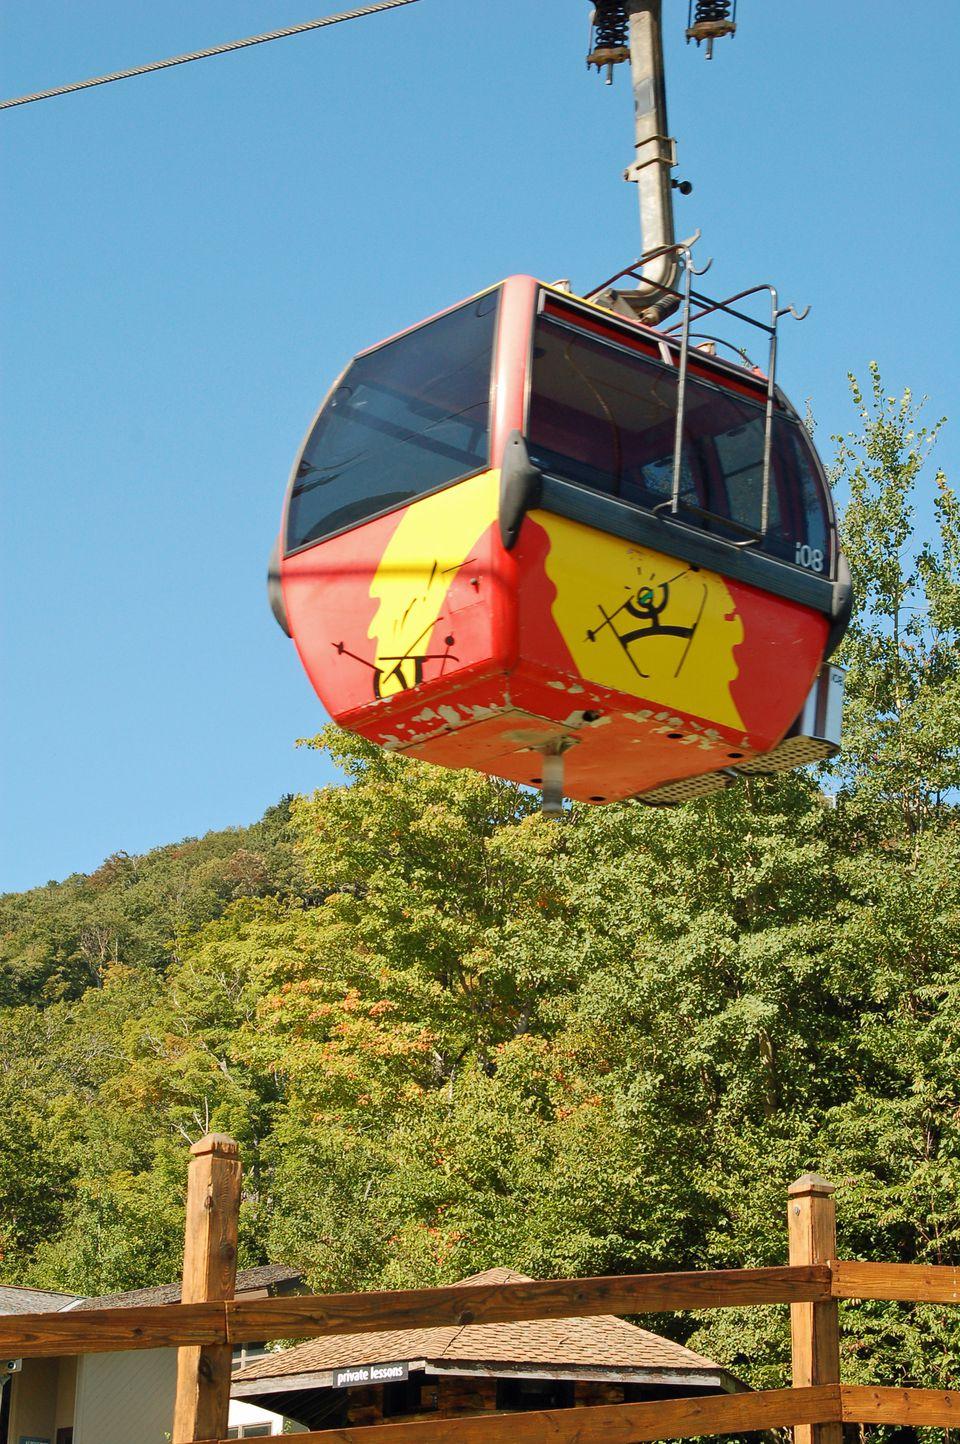 Gondola Rides at Killington in Killington Vermont